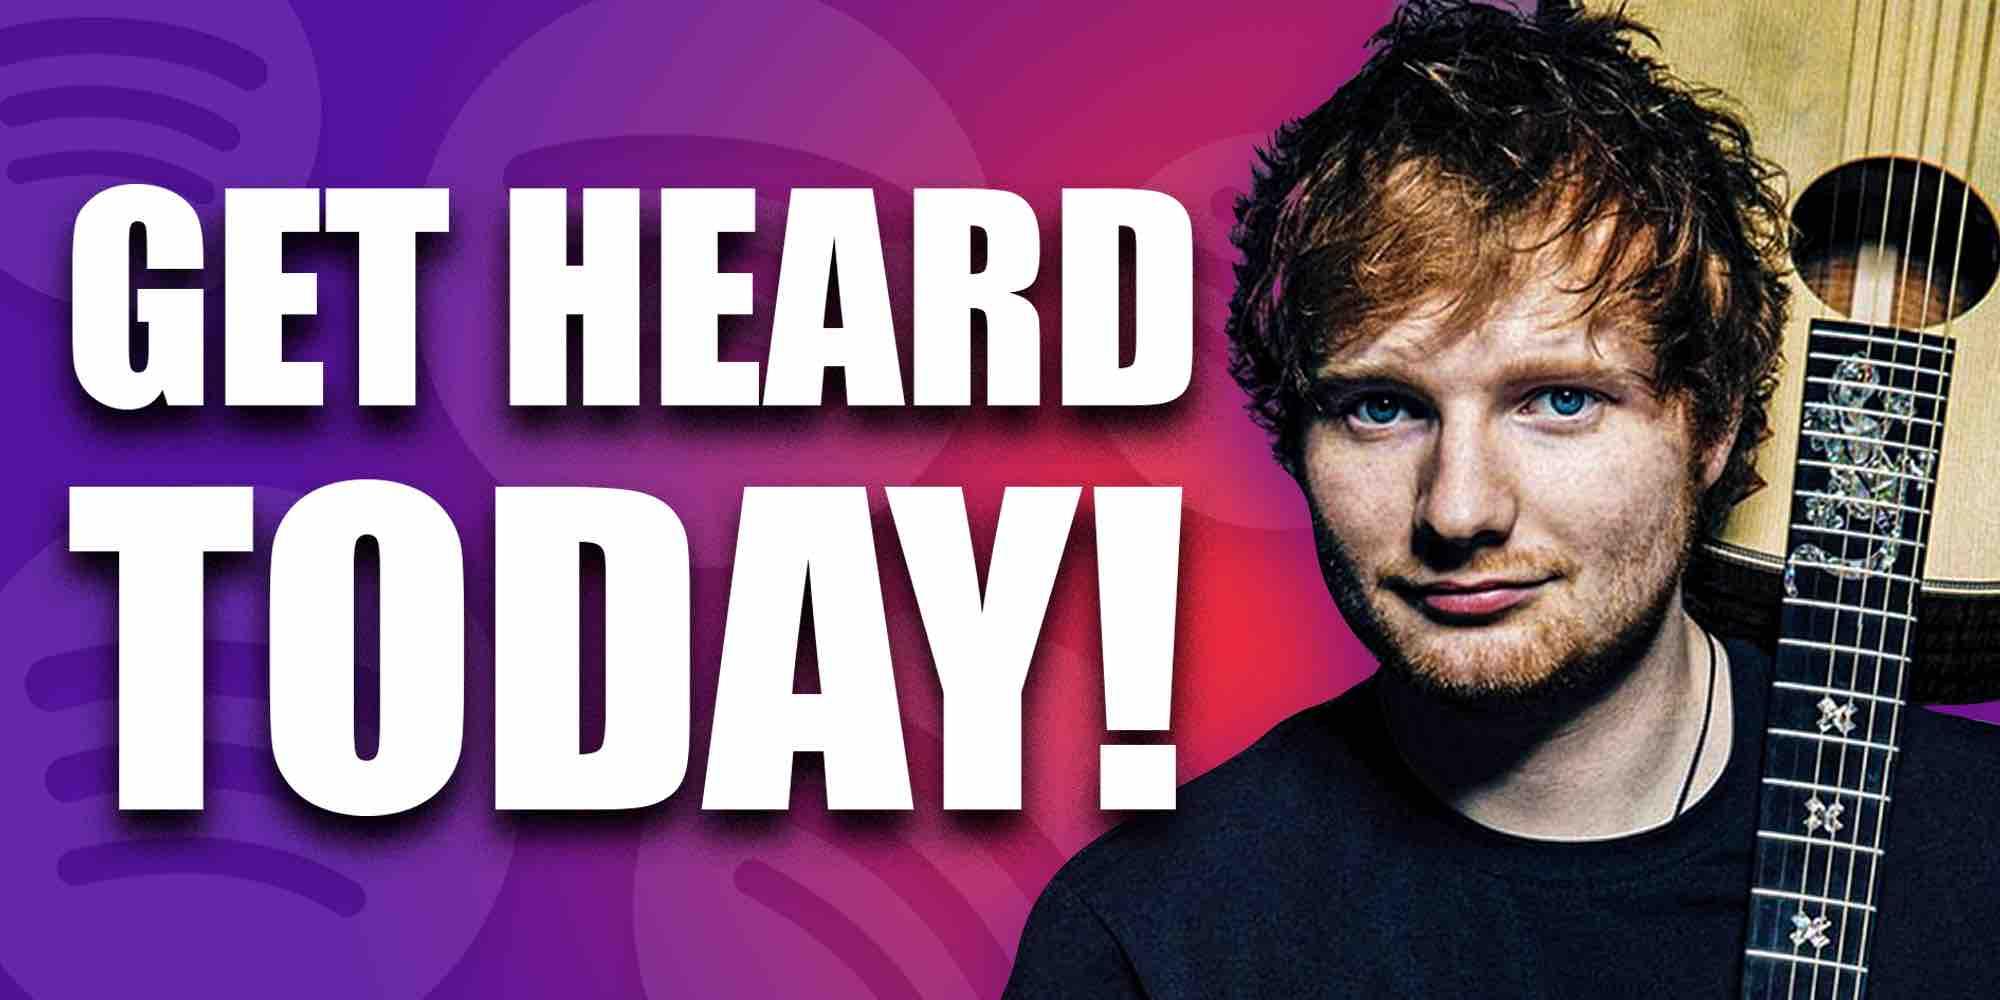 Get heard on Spotify playlists